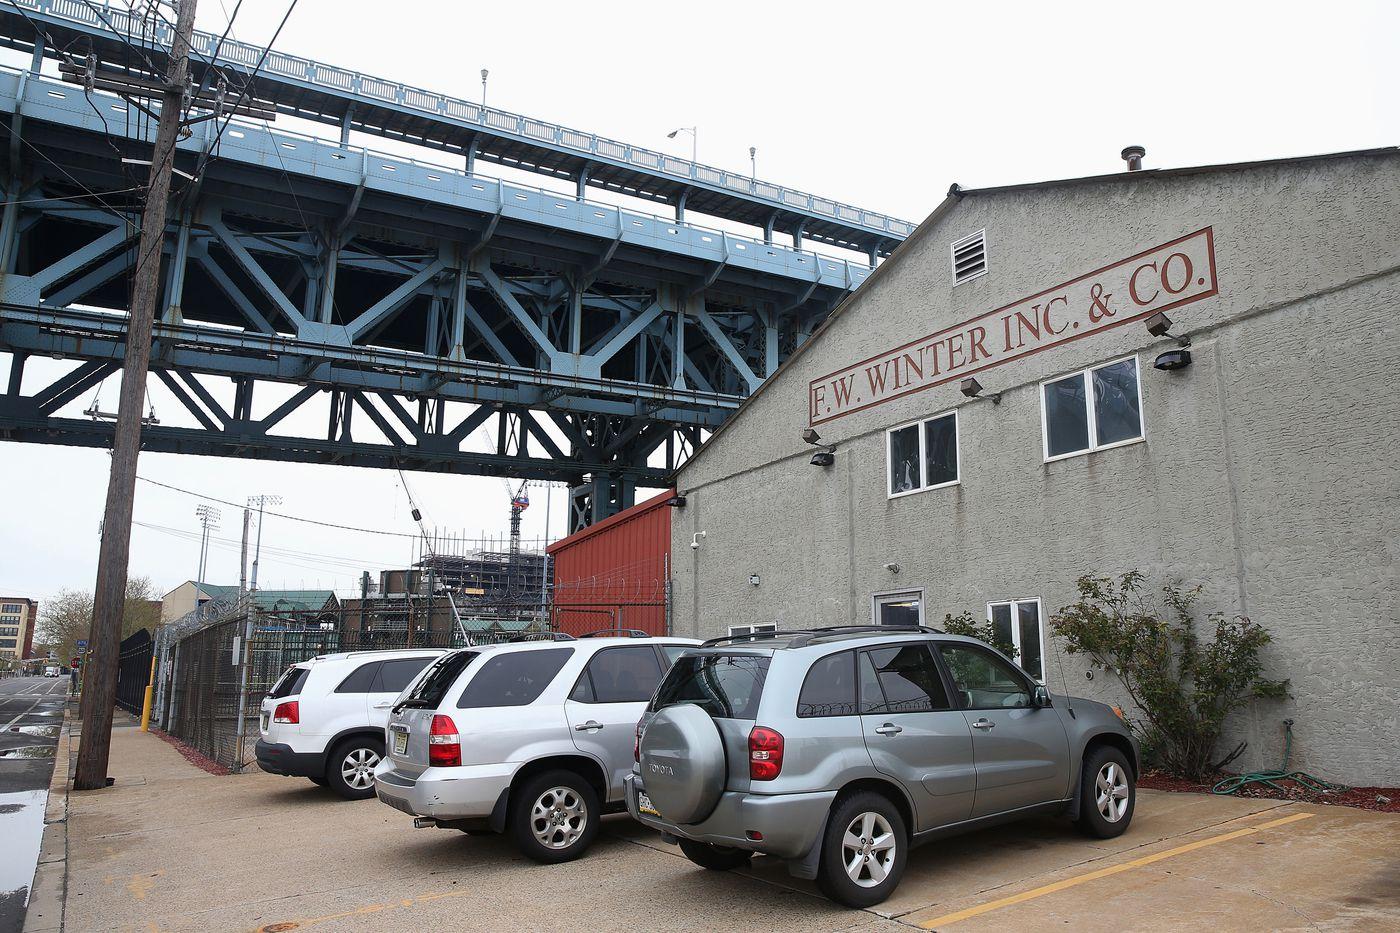 Delay sought again for Camden billboard proposal